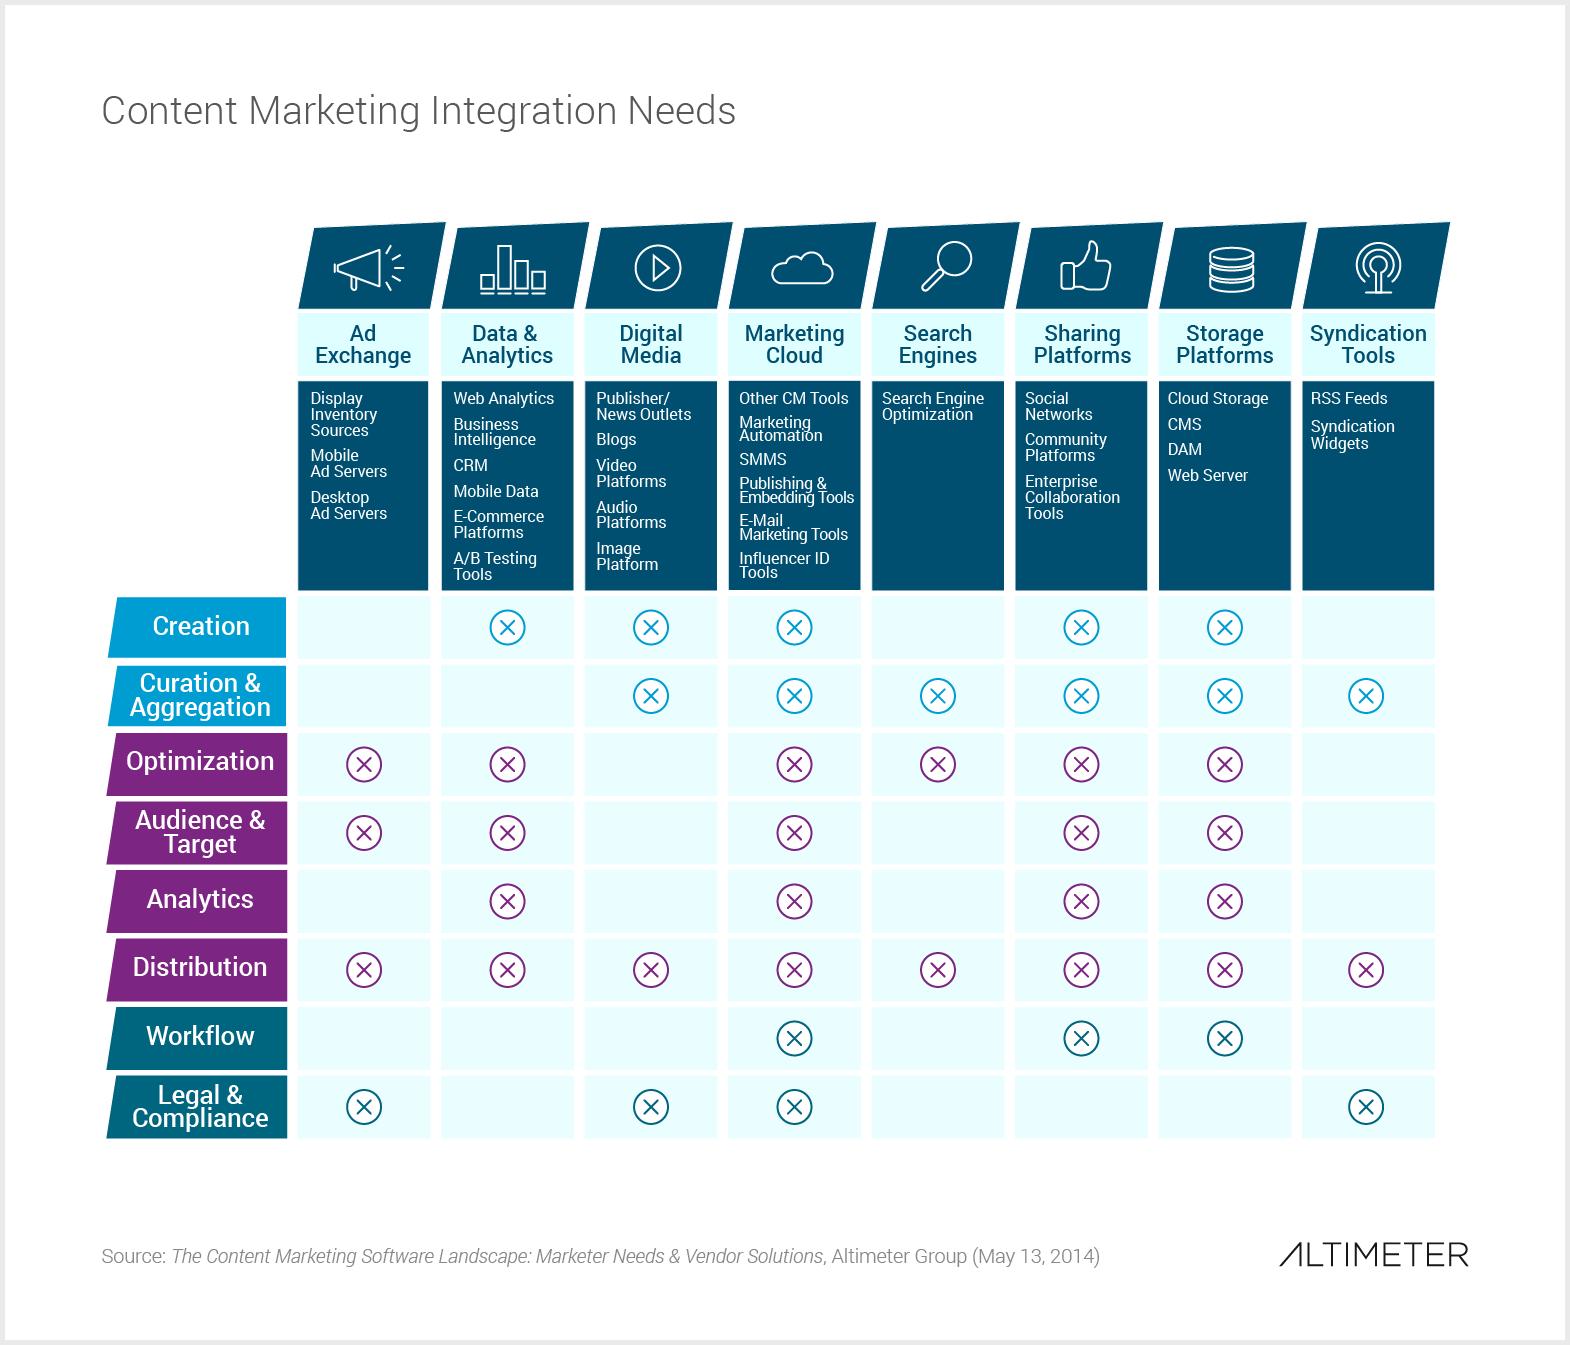 Content Marketing Software Integration Needs